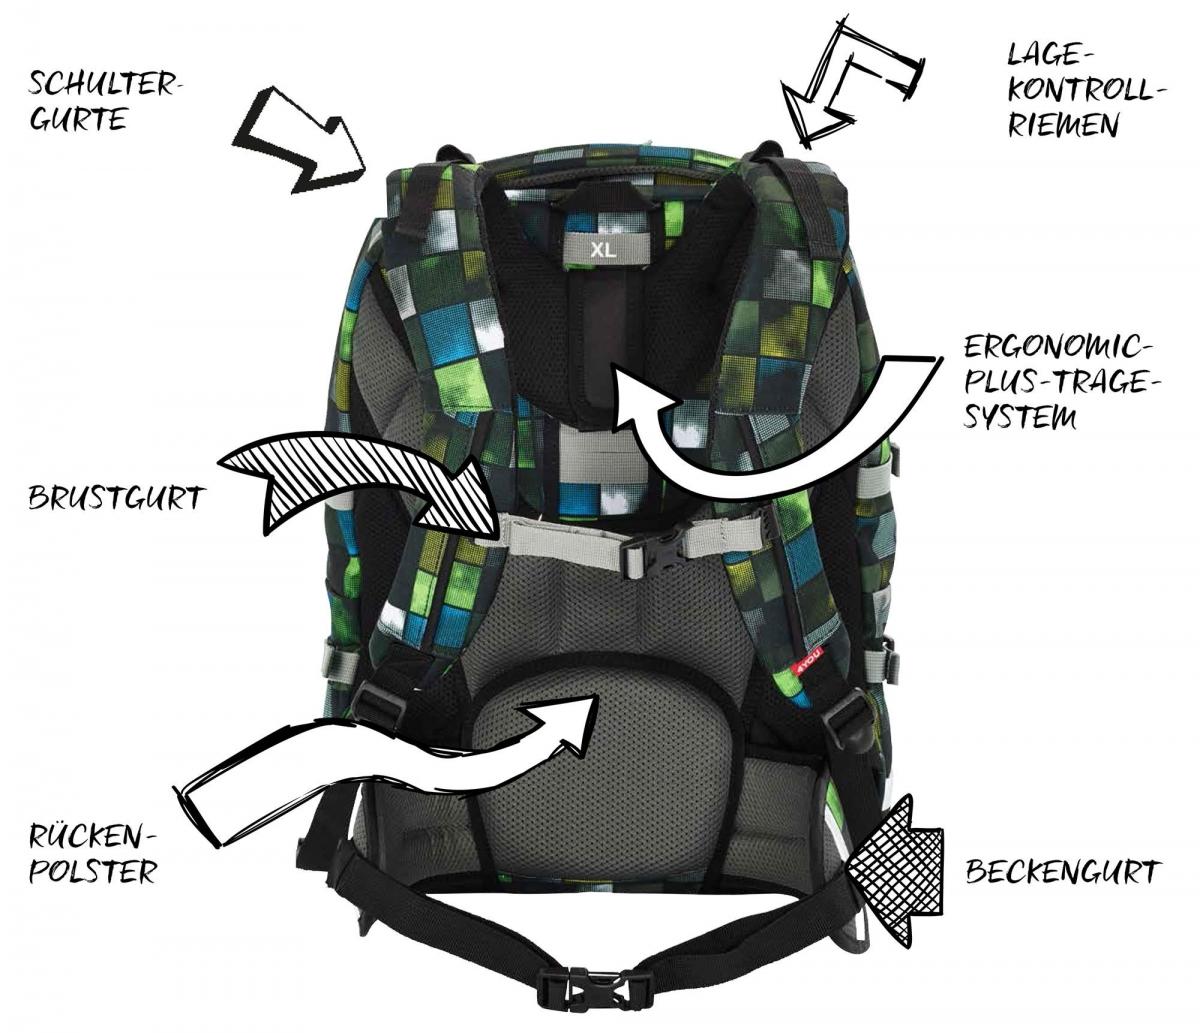 4you jampac schulrucksack tricodes 3tlg mit schlamperbox. Black Bedroom Furniture Sets. Home Design Ideas